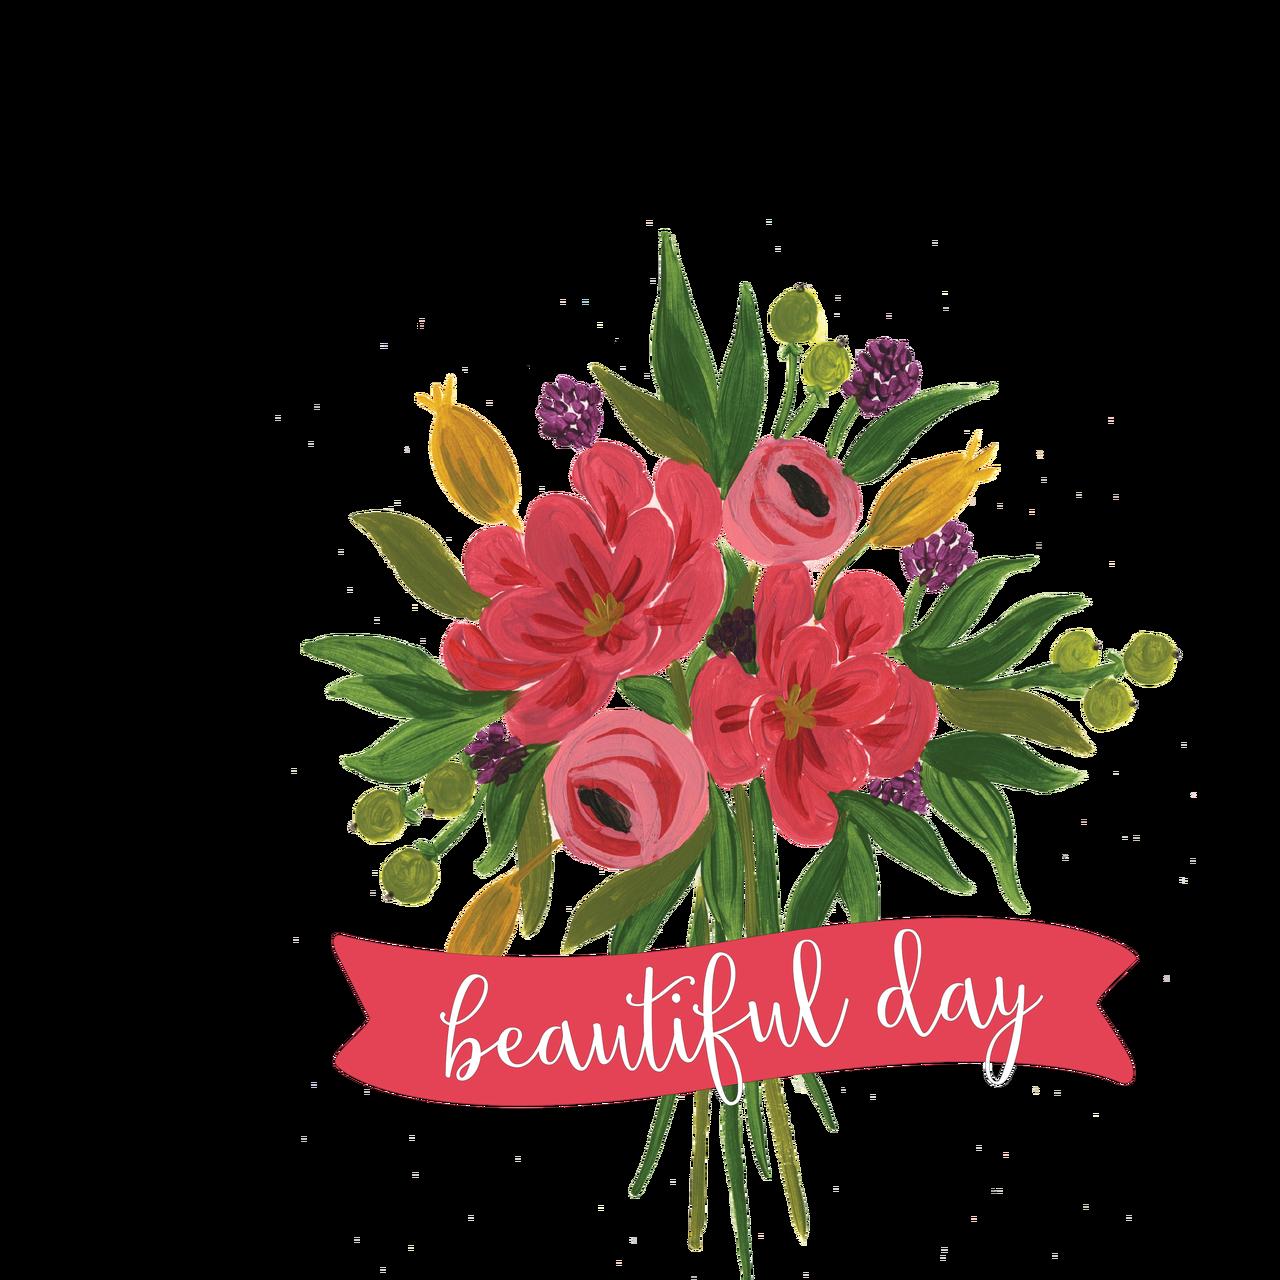 Beautiful Day Bouquet Print & Cut File